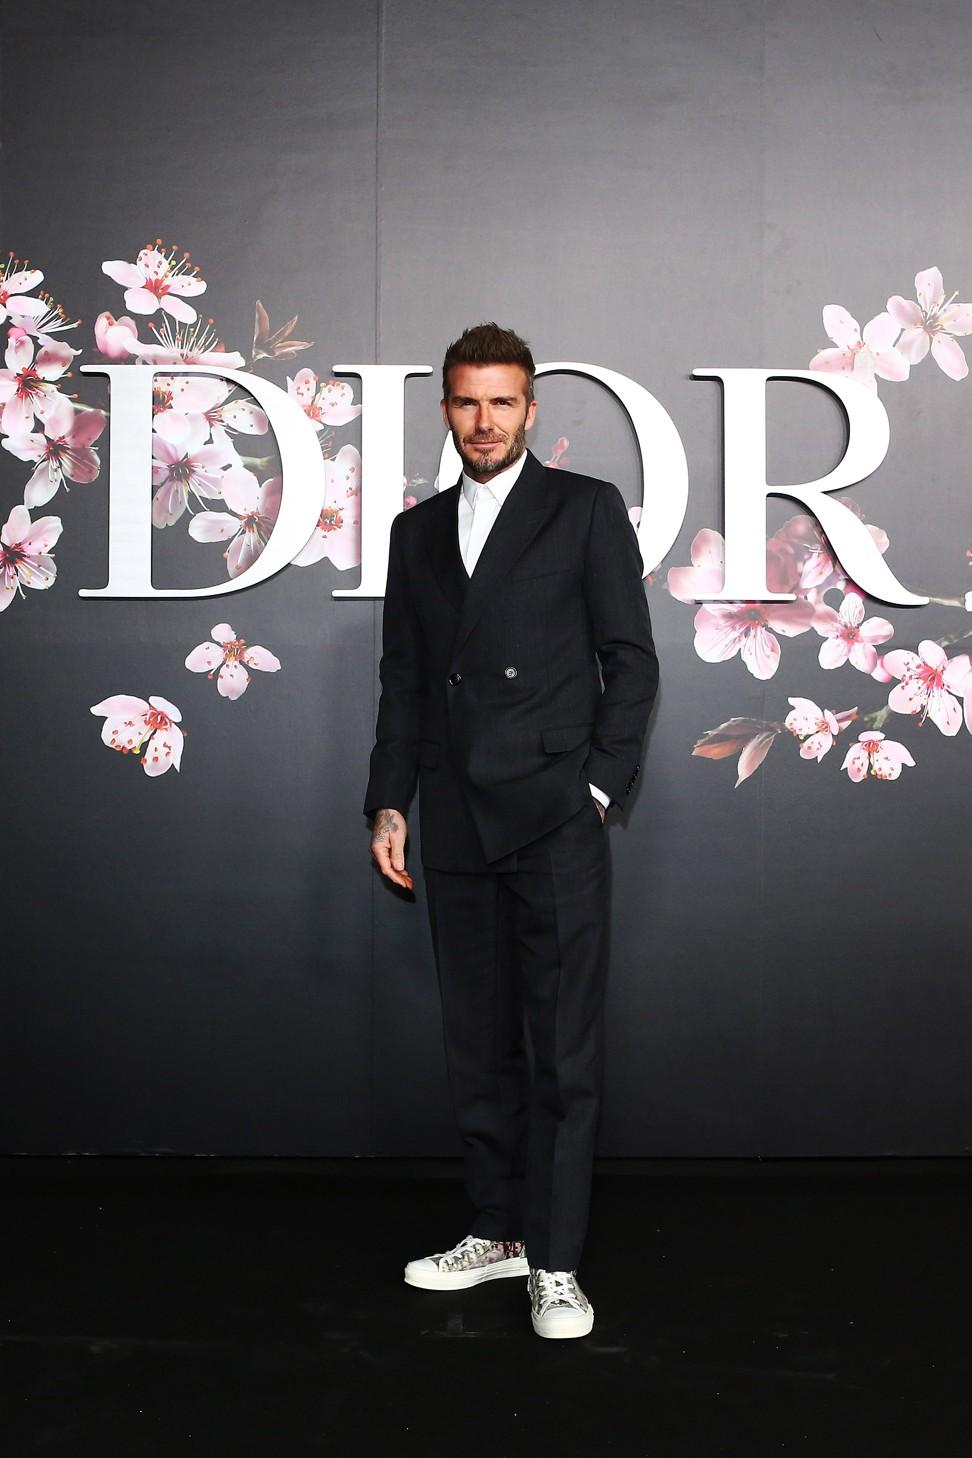 bec9b183a3 Dior CEO talks creative disruption